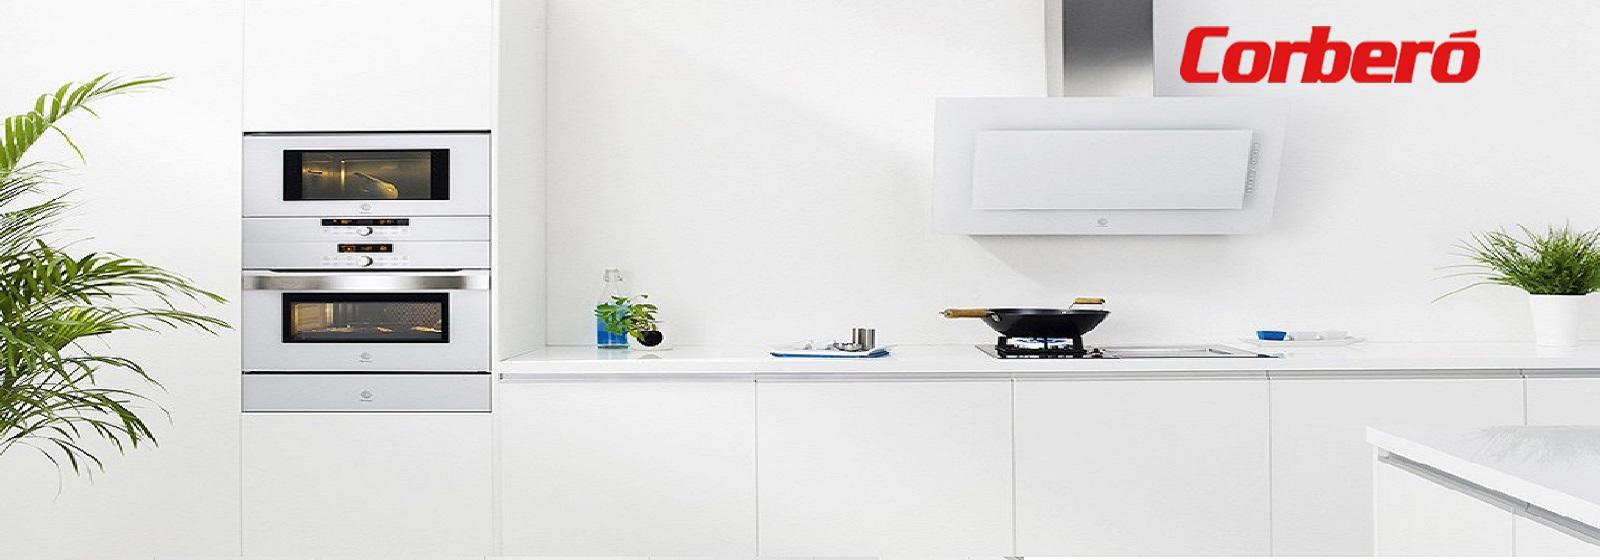 Electrodomésticos Lavadoras Secadoras Lavavajillas Frío Cocinas Hornos Placas Campanas Microondas Hornos sobremesa Agua cliente sanitaria